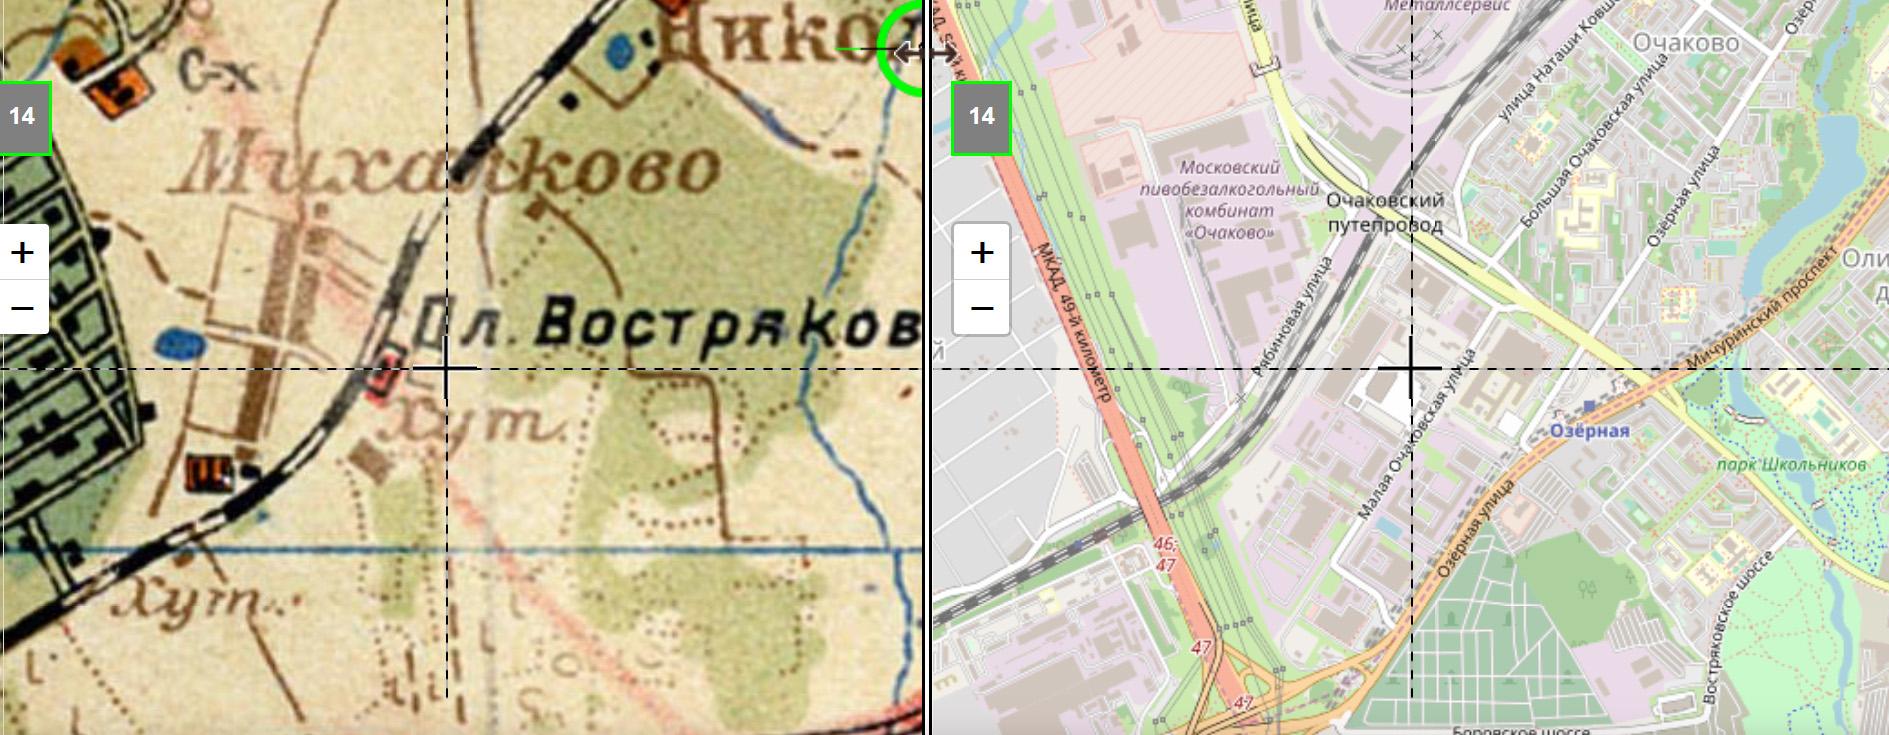 1931 Михалково